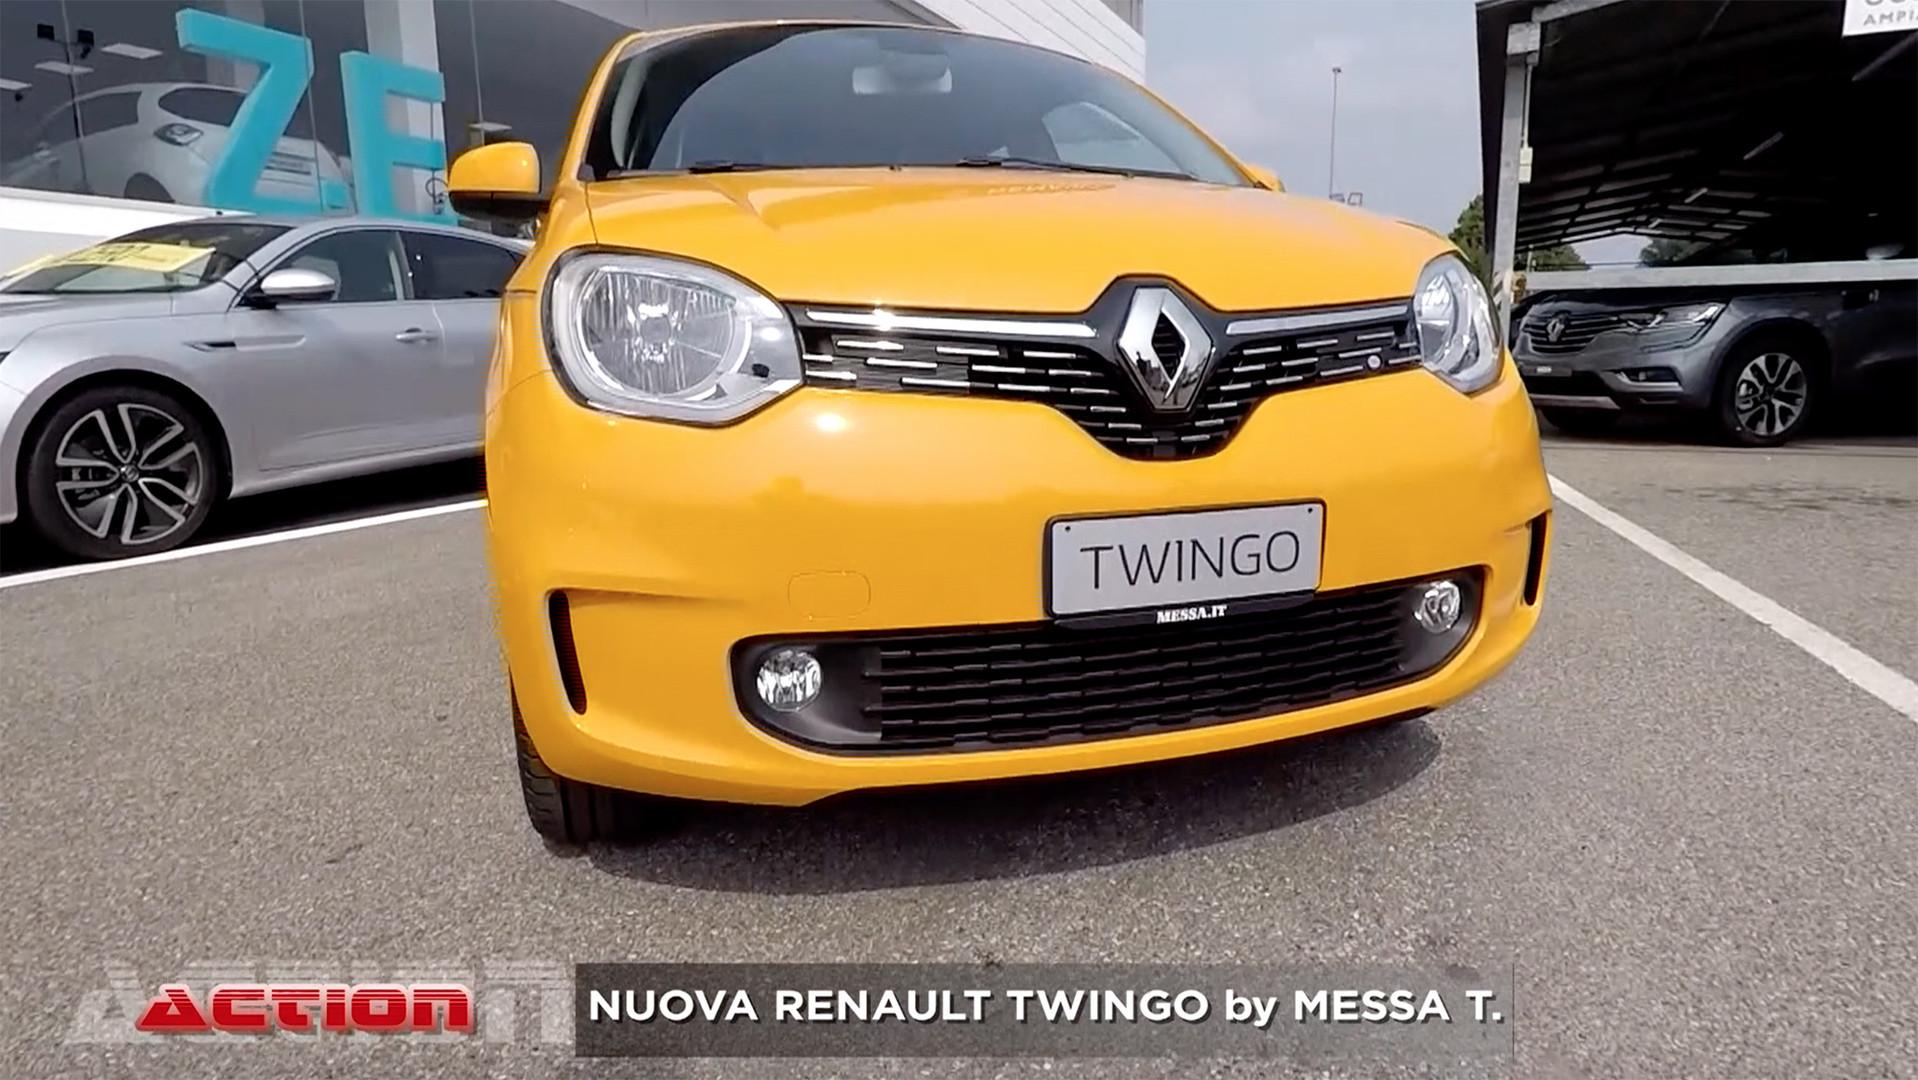 Nuova Renault Twingo | Concessionaria Messa T.